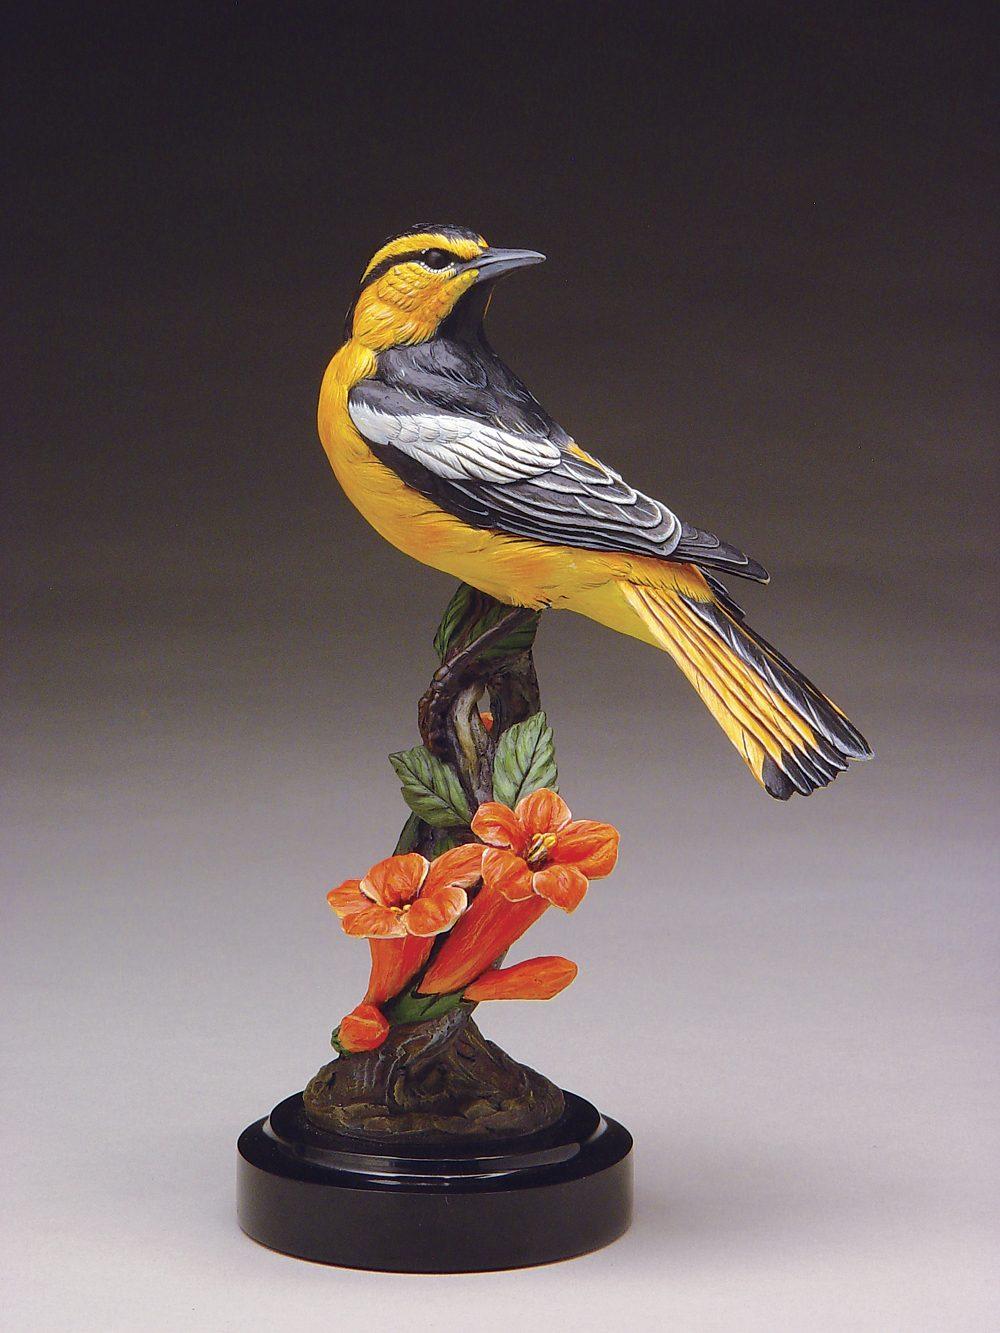 Bullock's Oriole | Joan Zygmunt | Sculpture-Exposures International Gallery of Fine Art - Sedona AZ